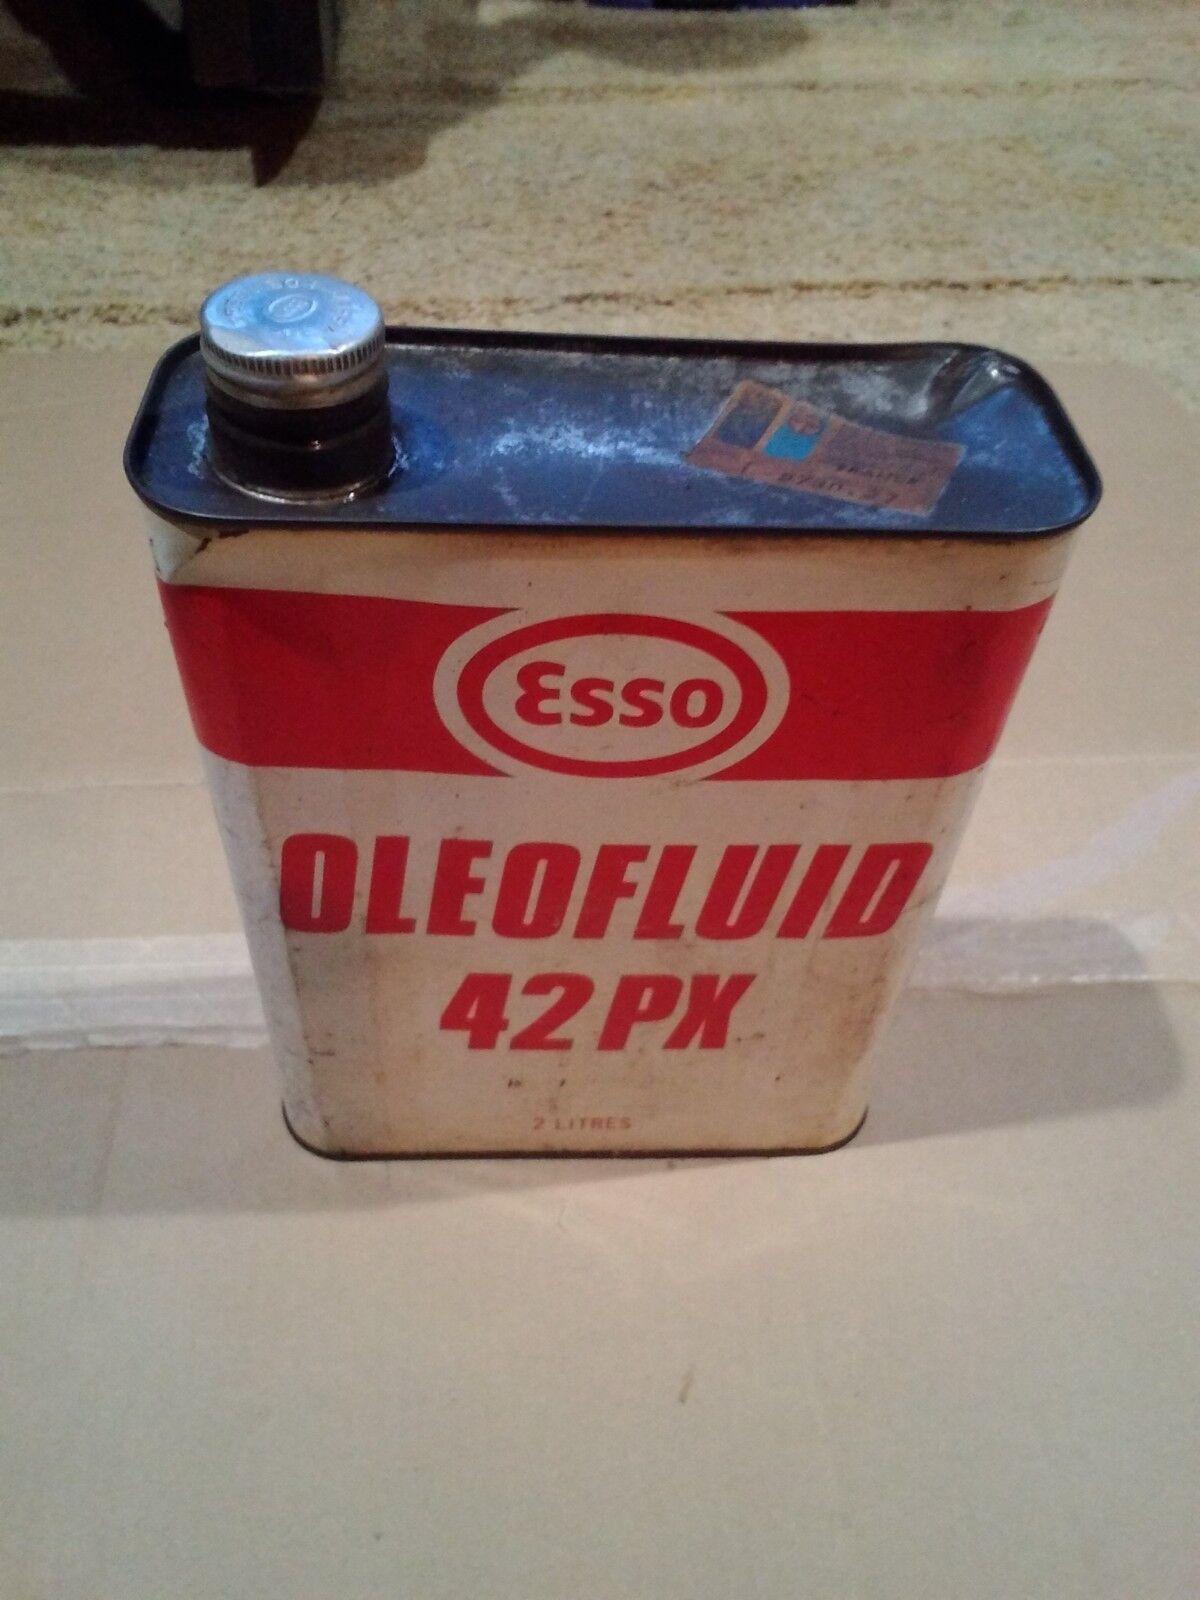 Esso Oleofuild  42PX